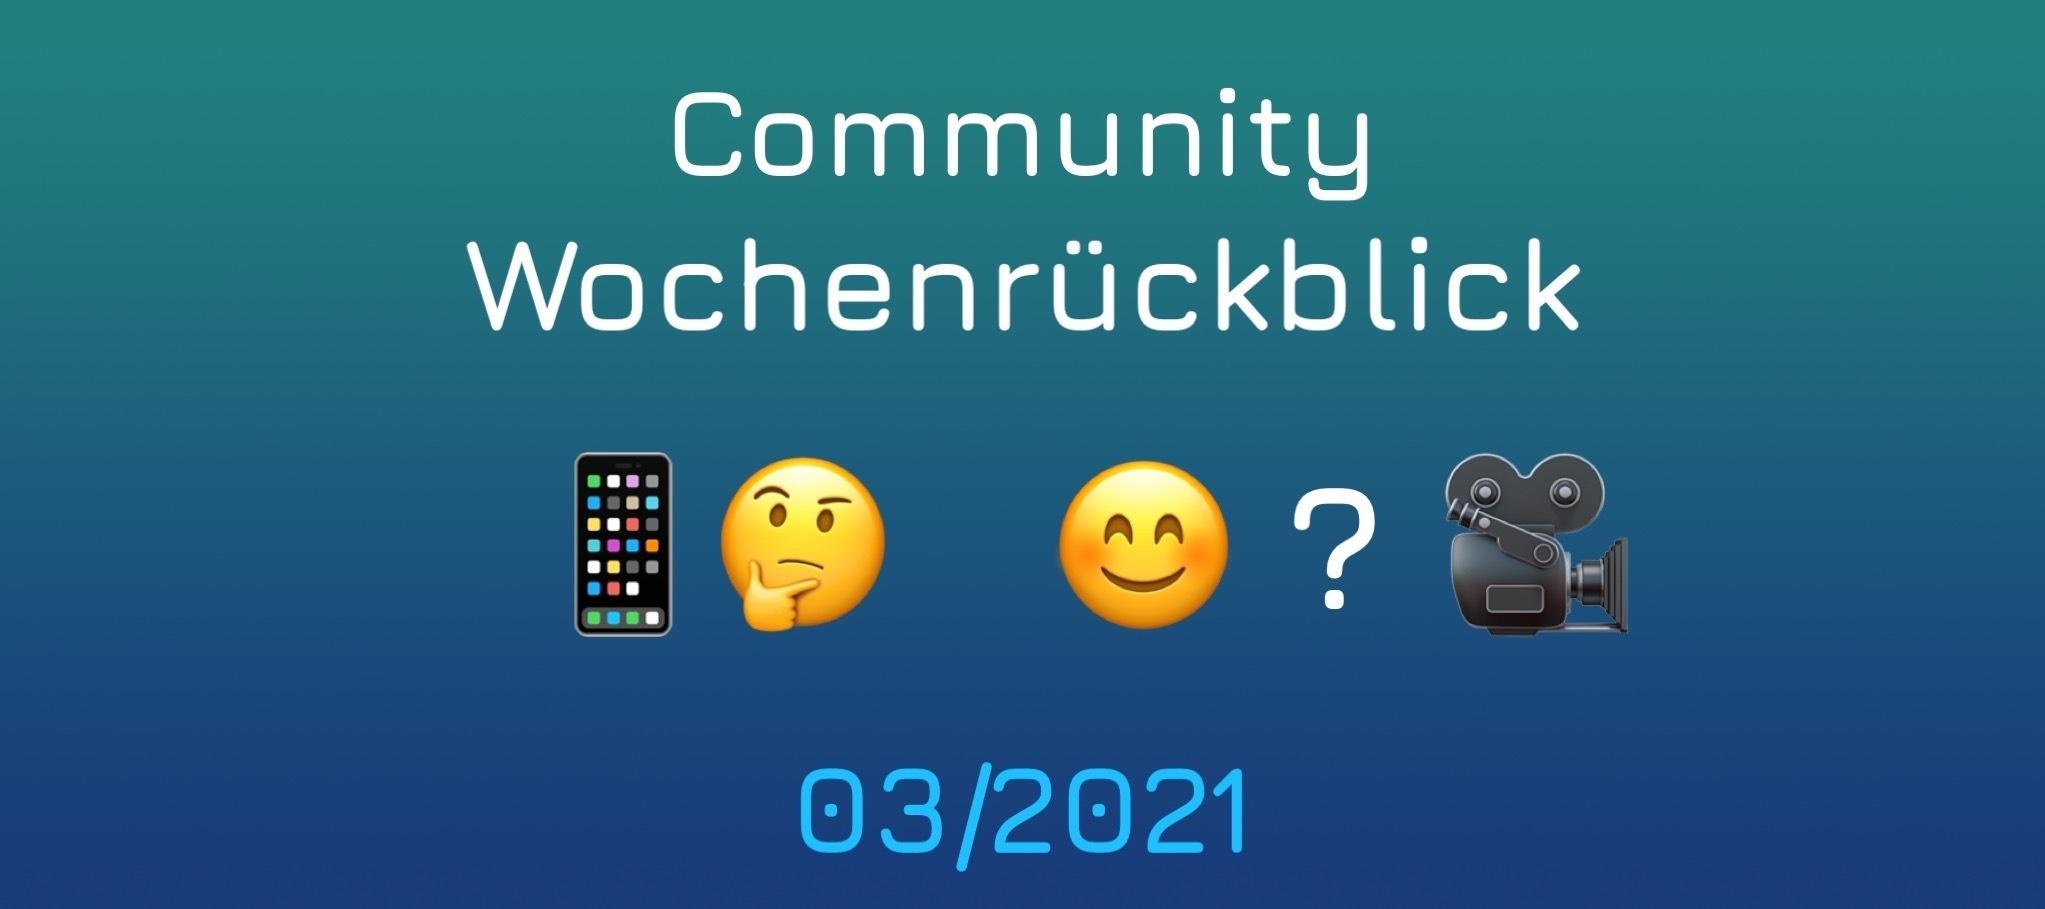 Community Wochenrückblick #03/2021